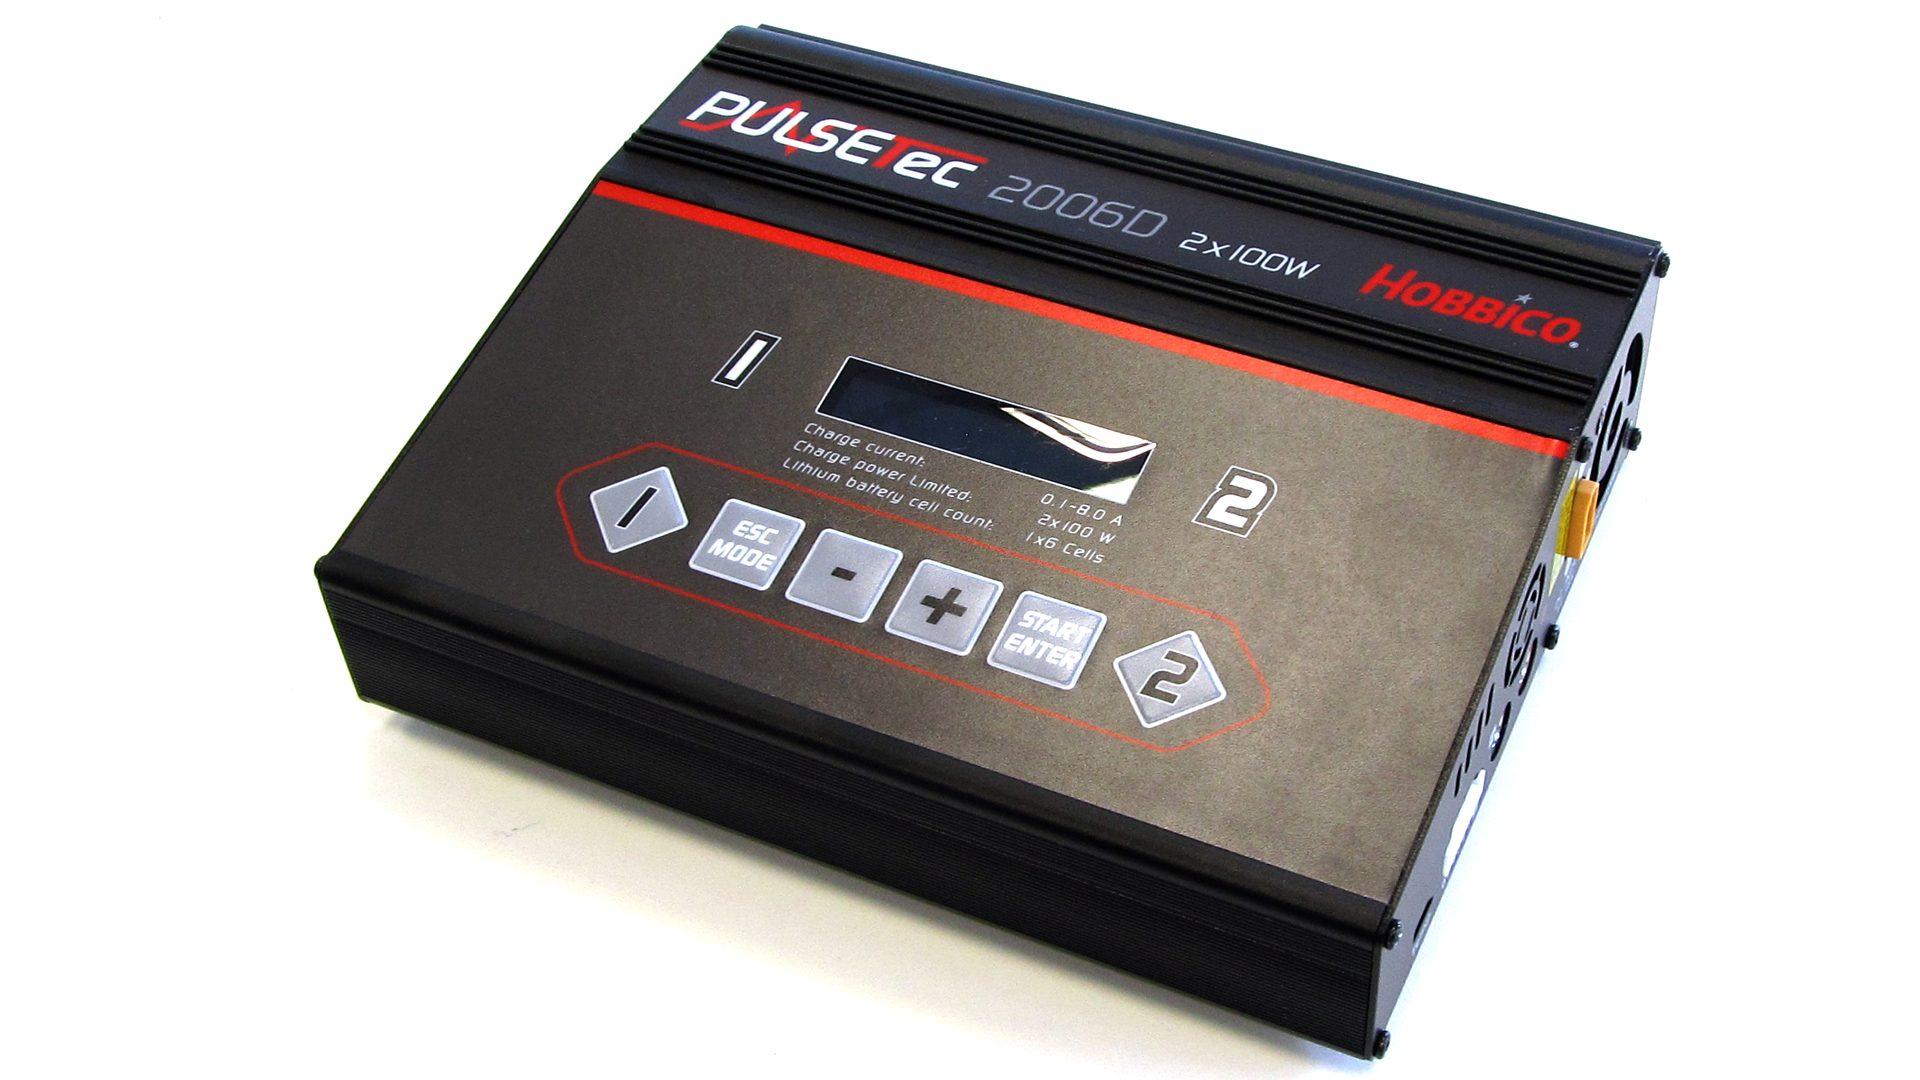 Hobbico PulseTec 2006 – Ladegerät [Ladeprogramme für NiCd-, NiMH-, LiPo-/LiFe-/LiIo- und Blei-Akkus]